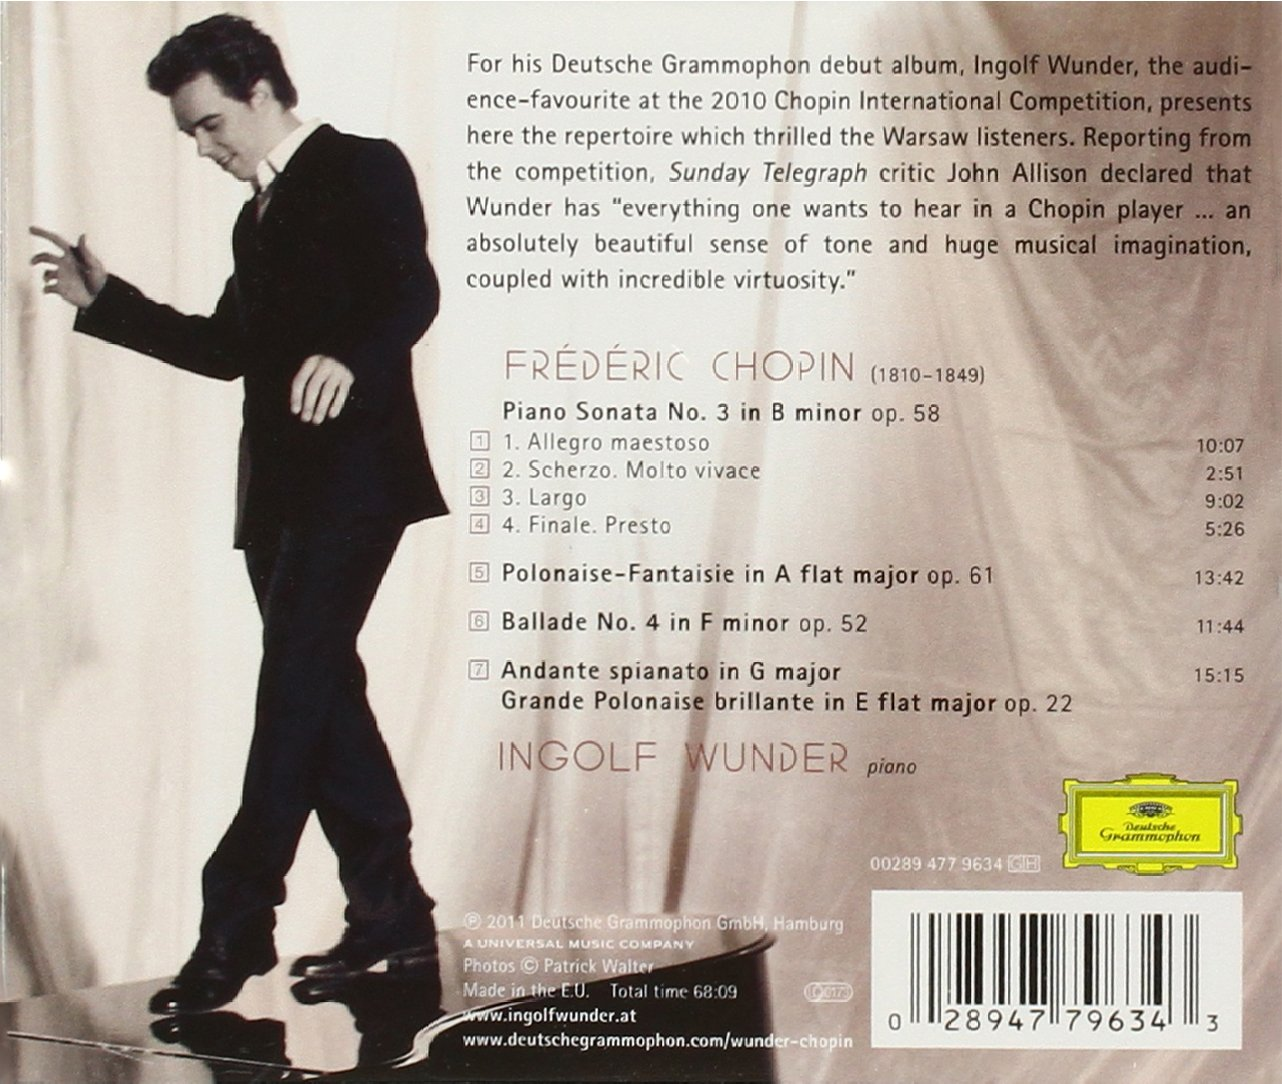 Chopin: Piano Sonata No. 3 / Polonaise No. 7 / Ballade No. 4, etc., Opp. 22, 52, 58, 61 by DEUTSCHE GRAMMOPHON,ROMANTICO,SOLO,MUSICA DA CAMERA,